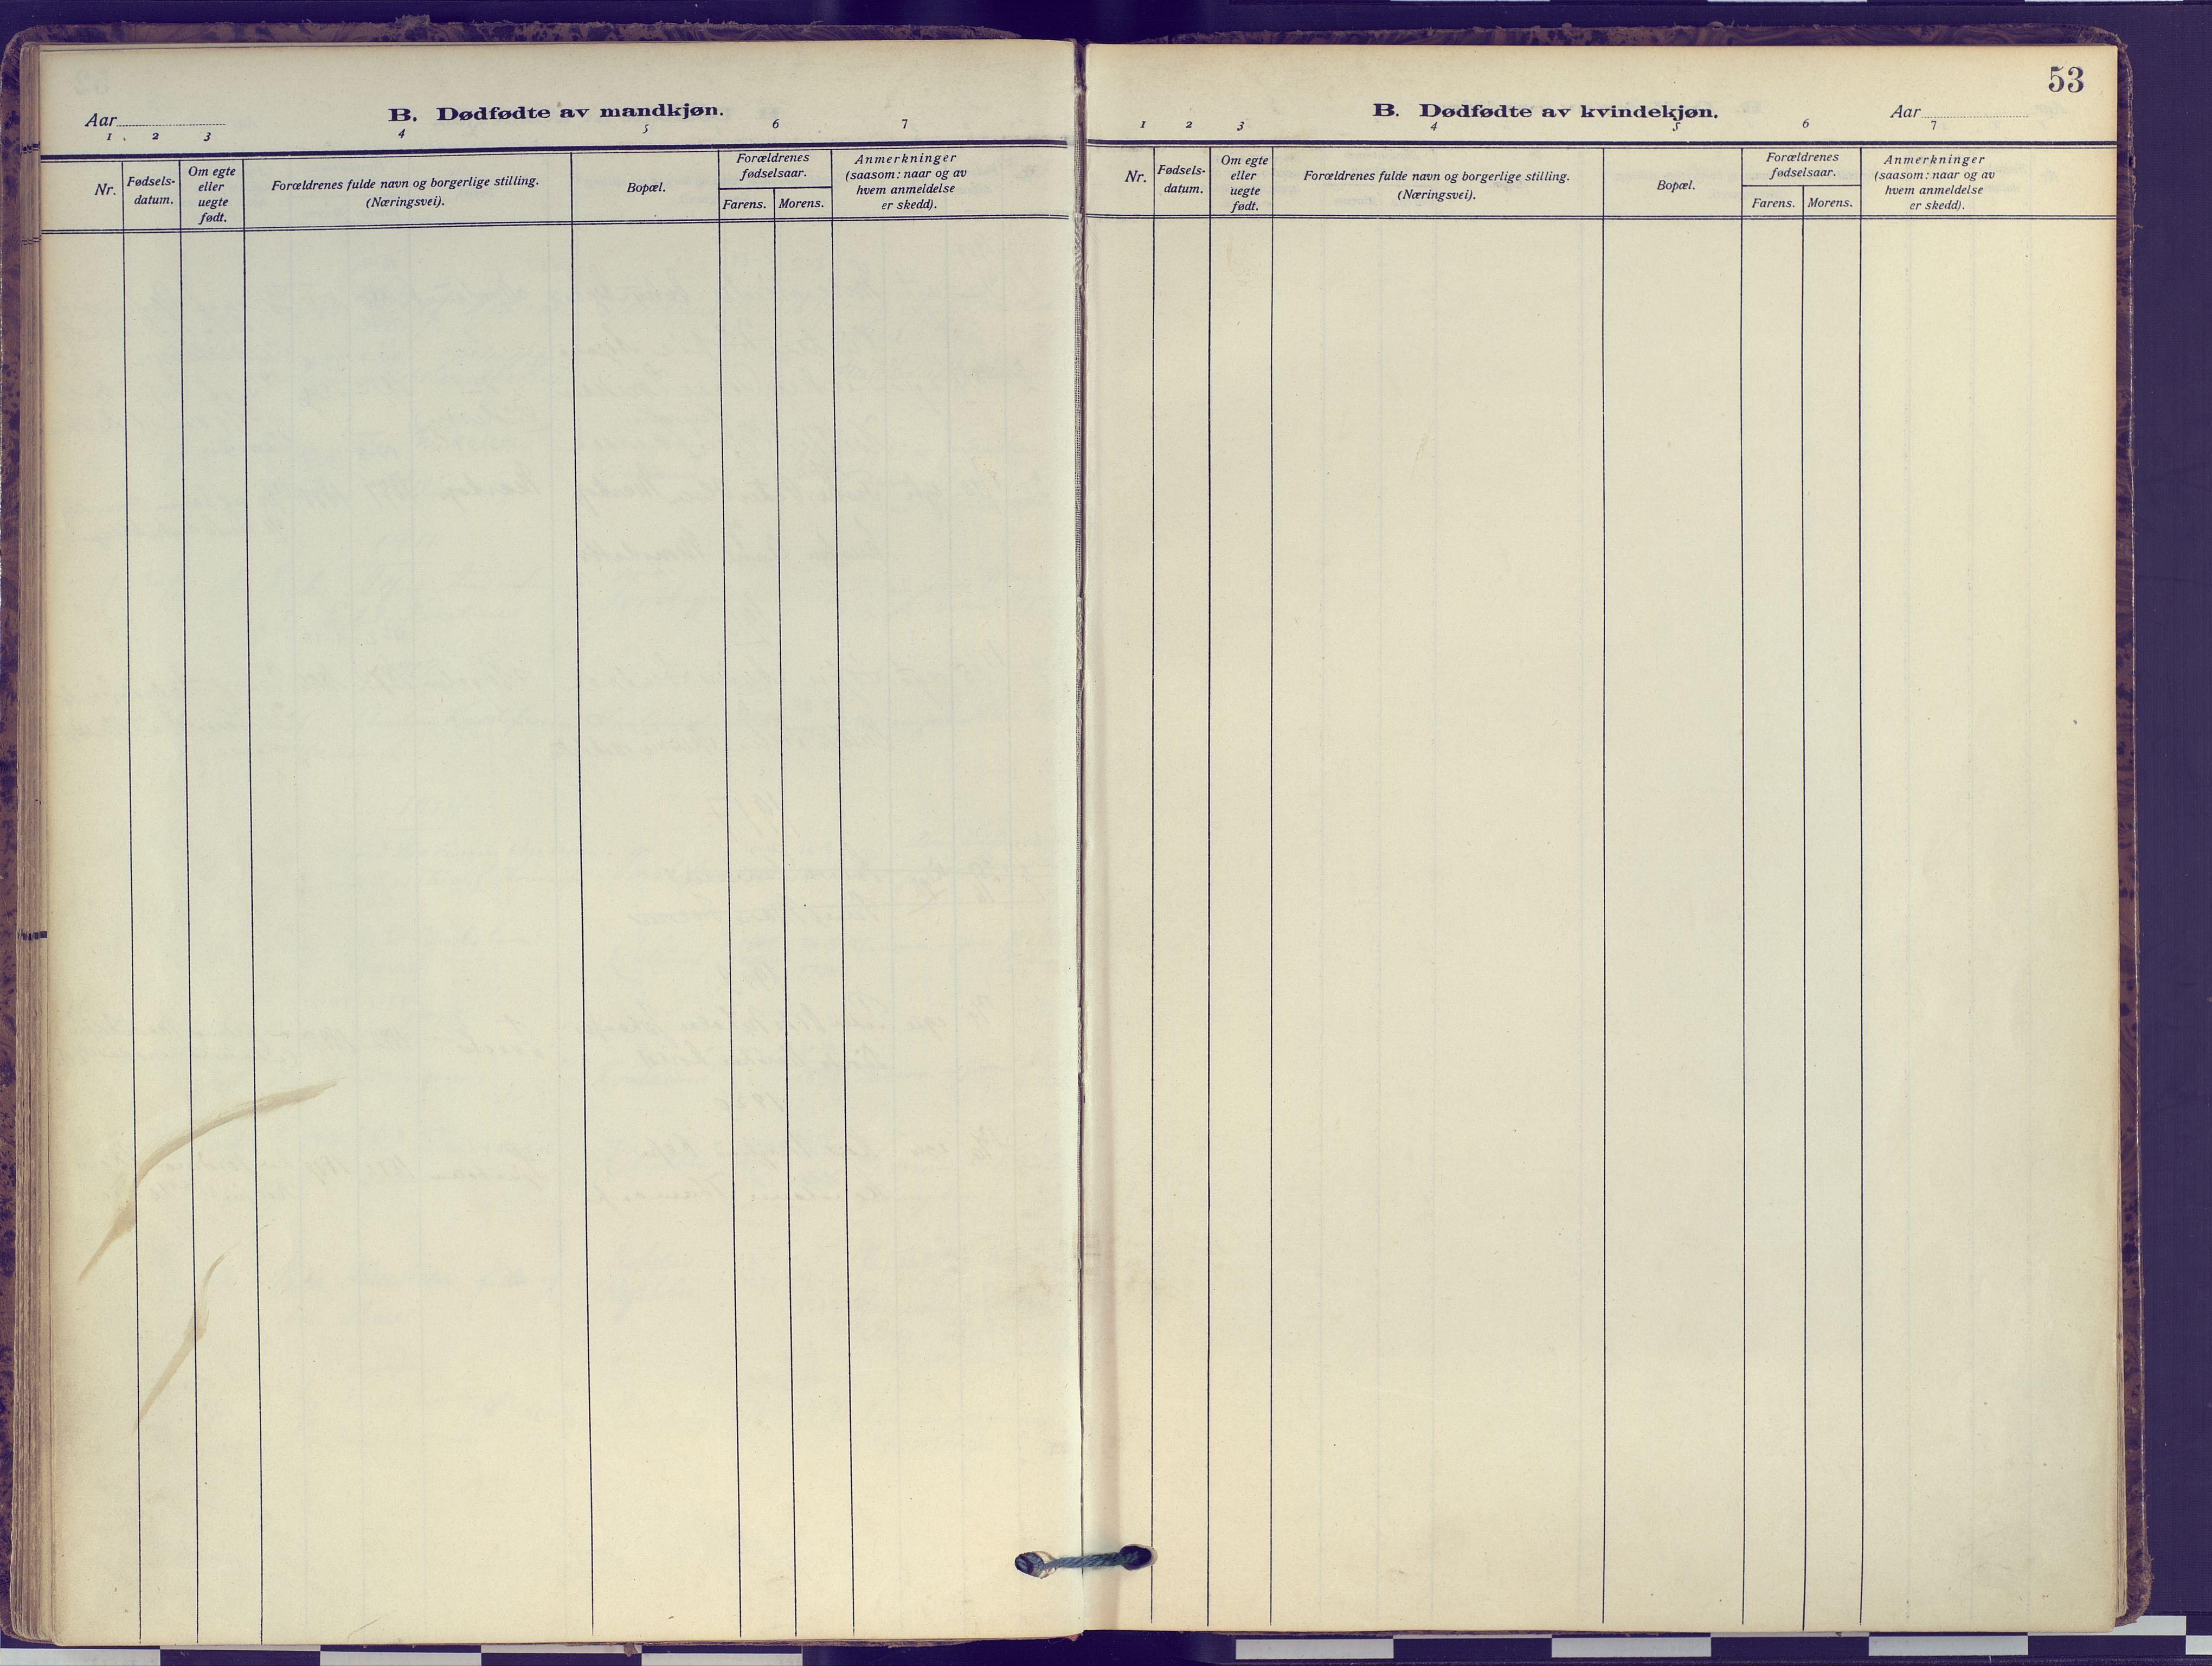 SATØ, Hammerfest sokneprestembete, Ministerialbok nr. 16, 1908-1923, s. 53